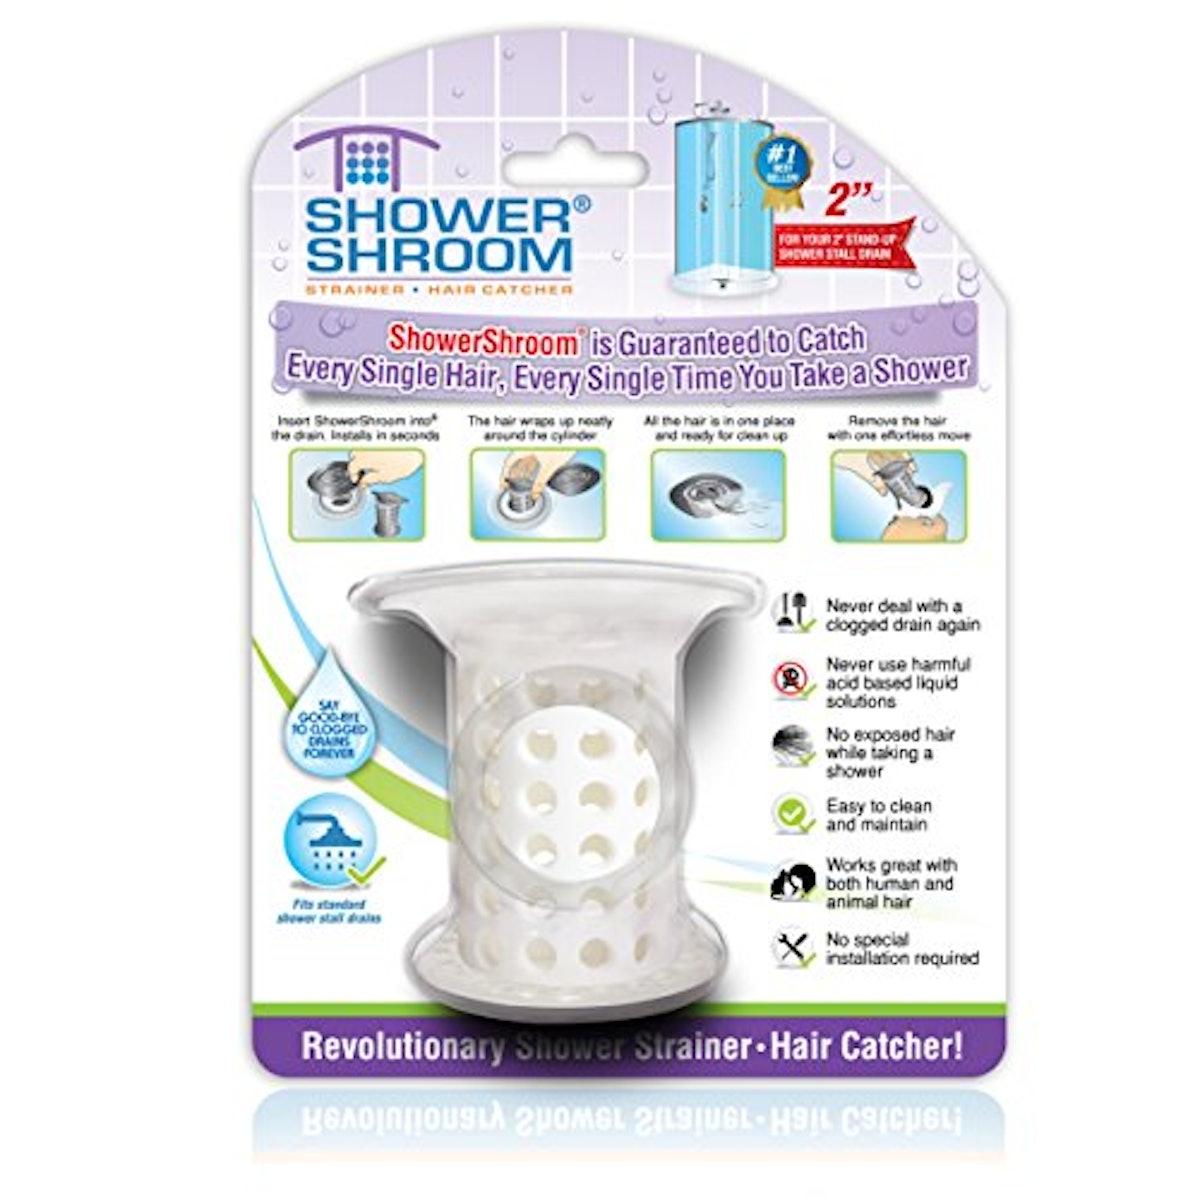 ShowerShroom Drain Protector